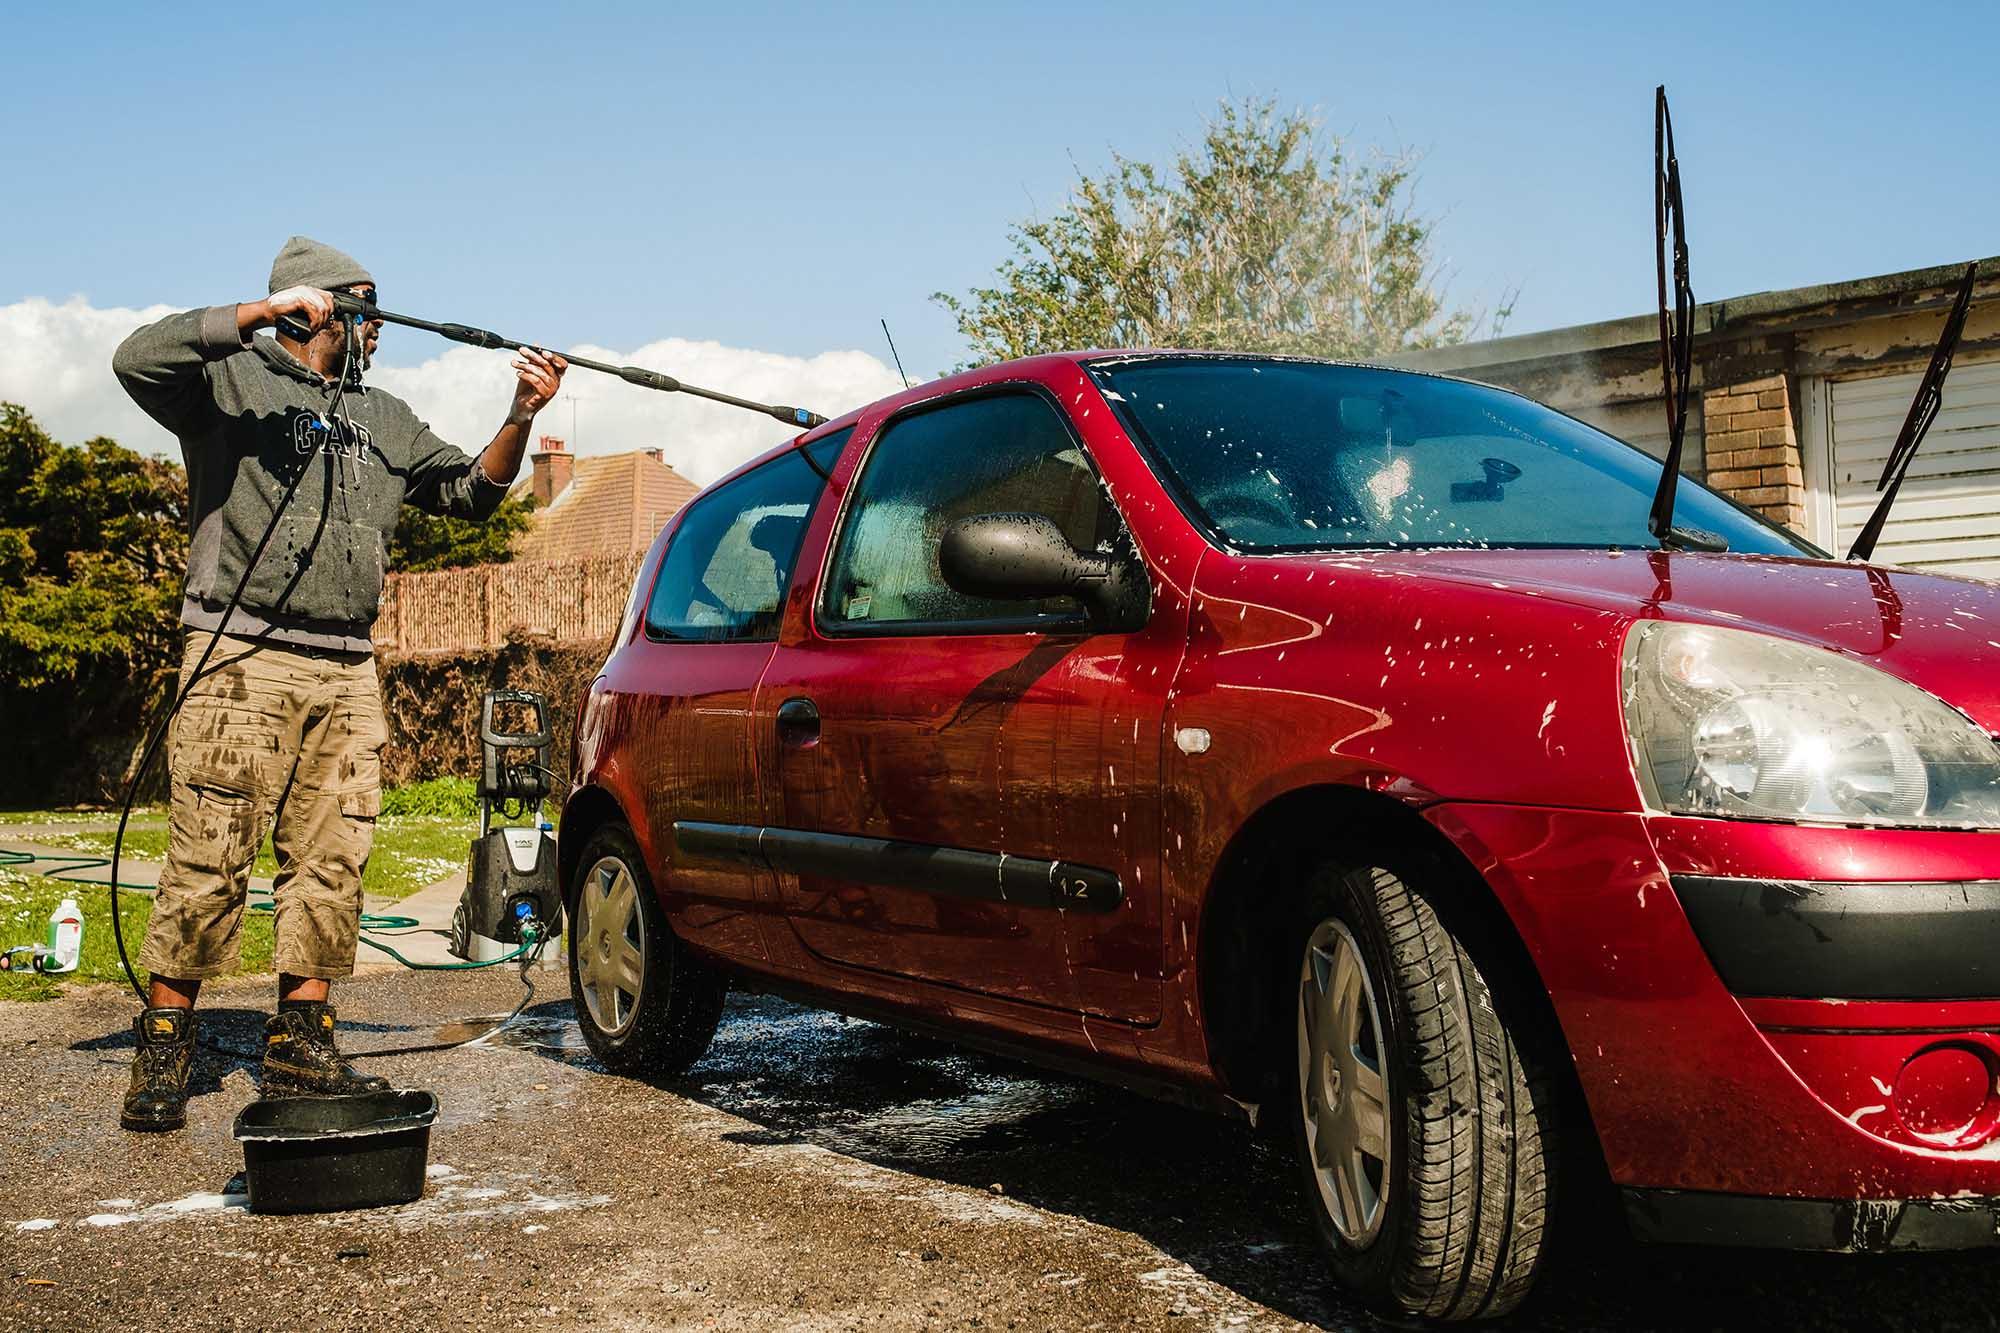 washing kiko the car